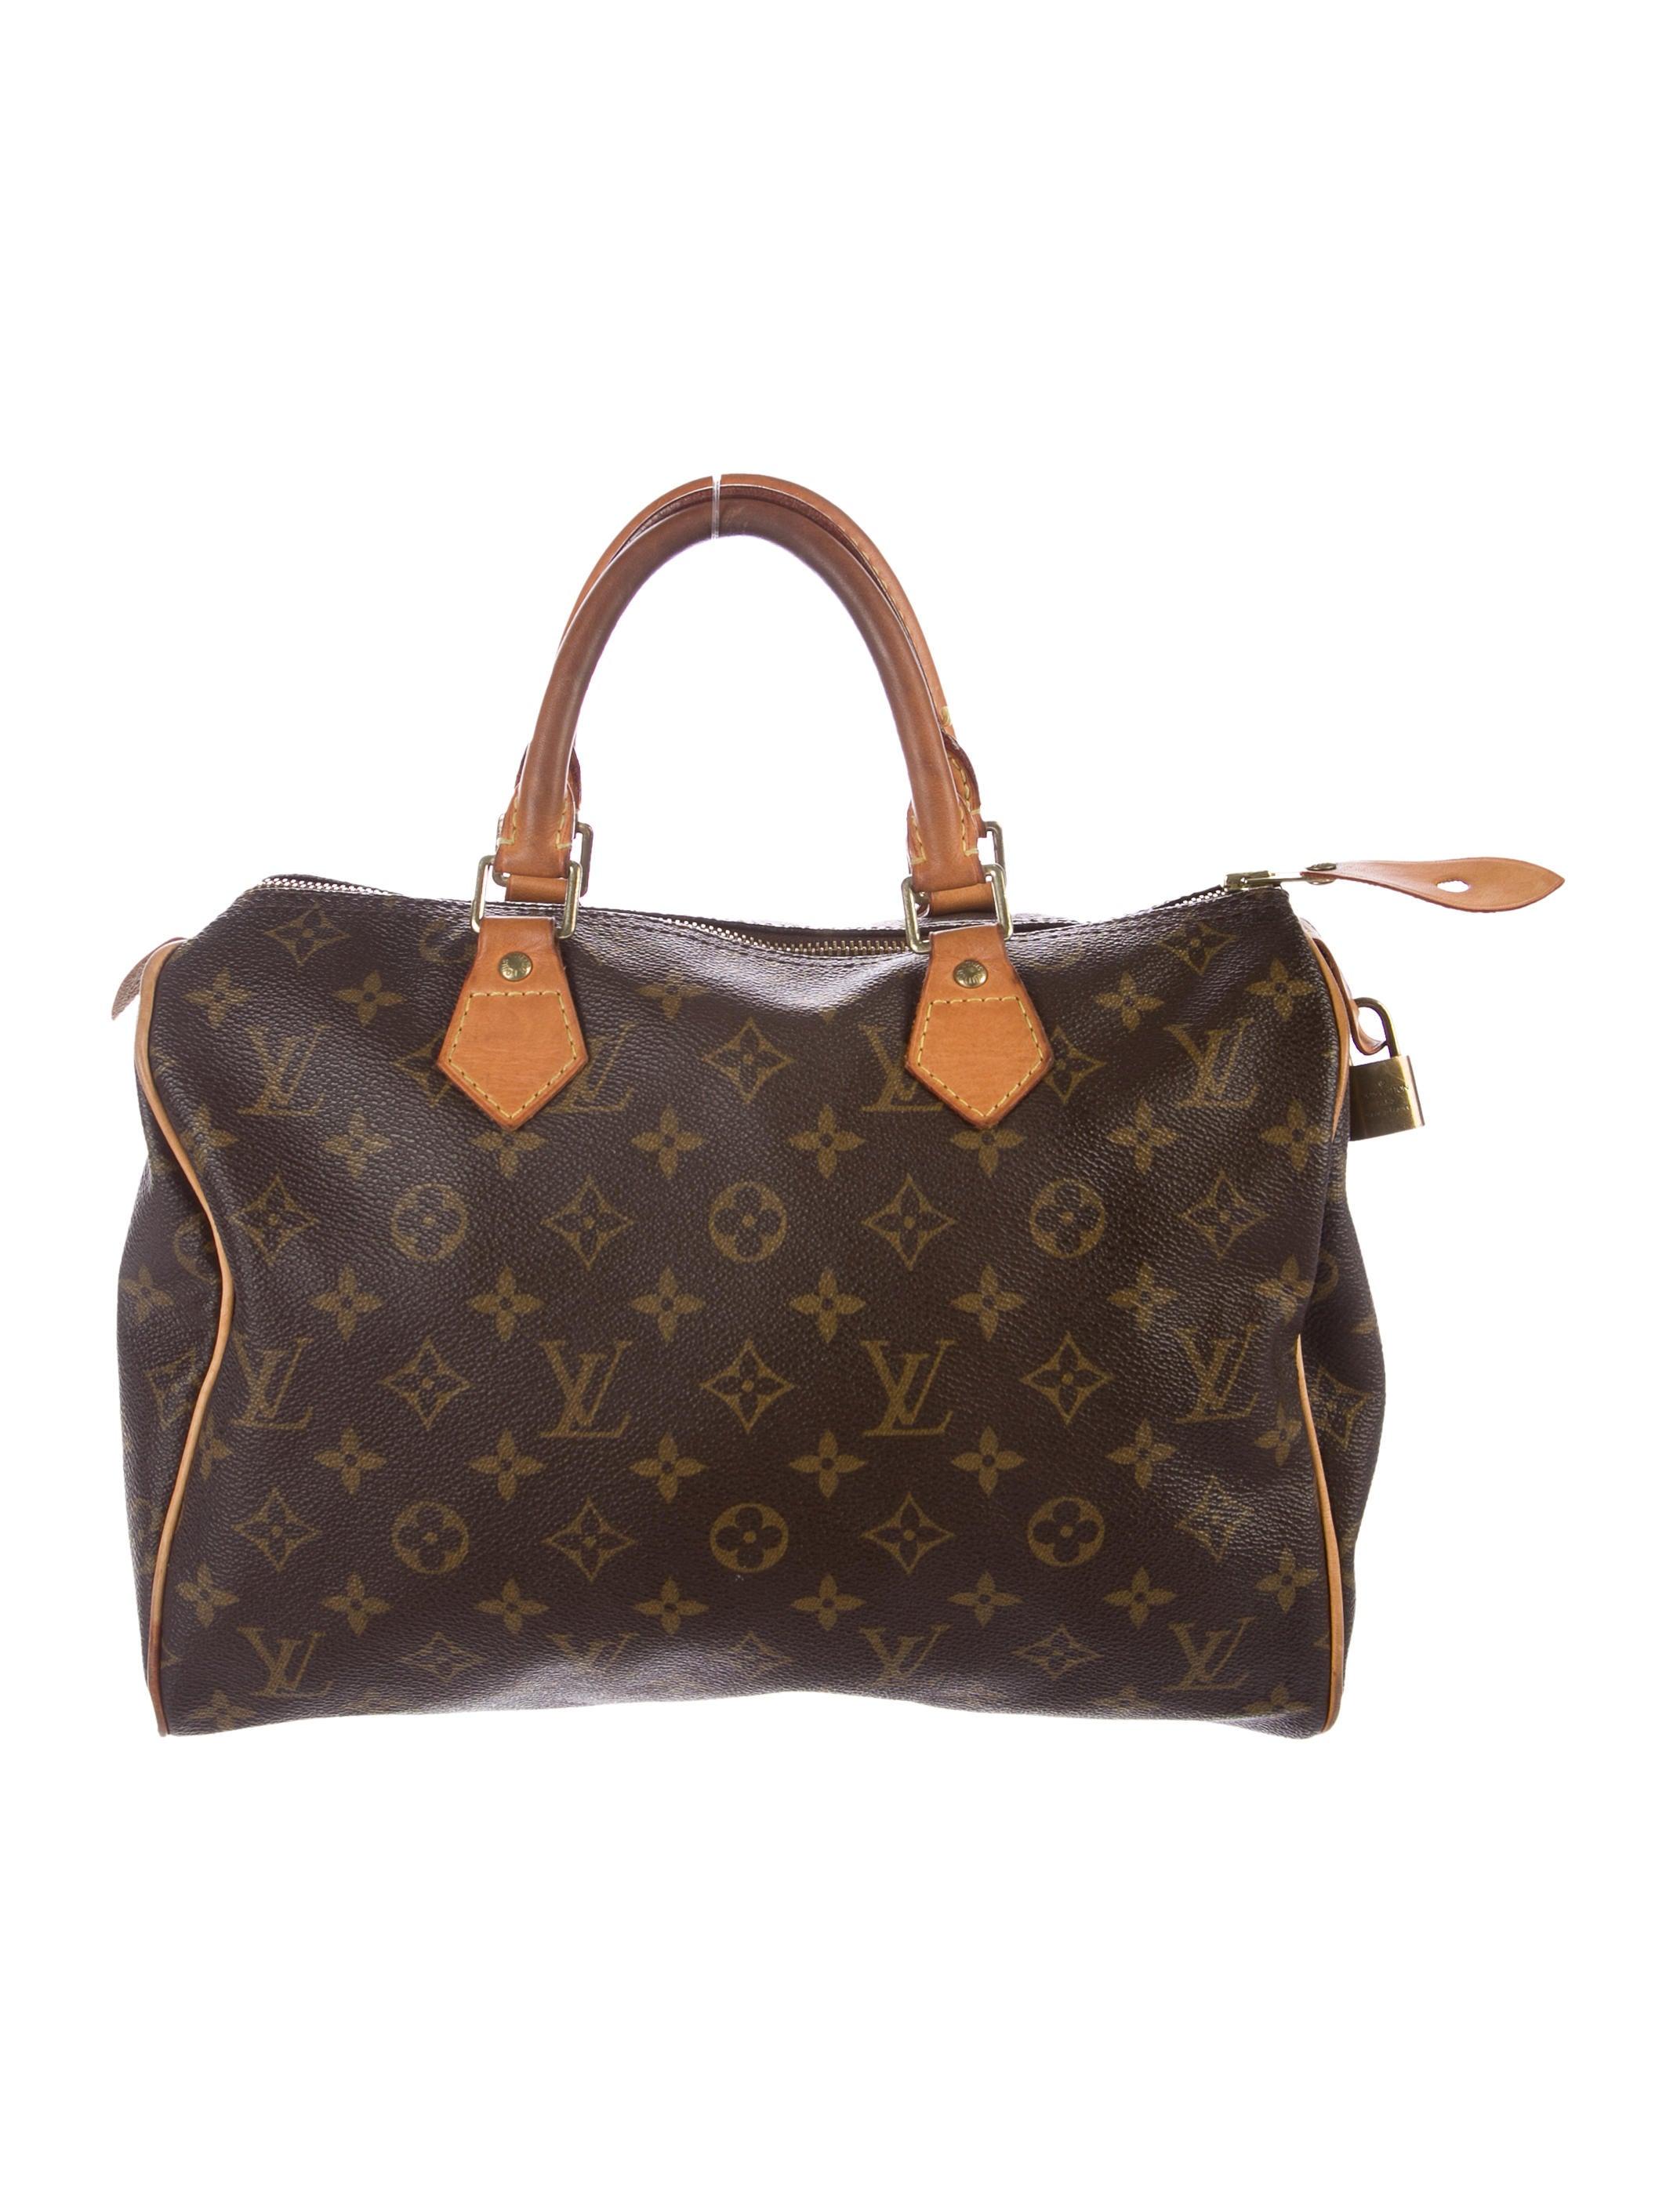 Louis vuitton monogram speedy 30 handbags lou133955 for Louis vuitton miroir speedy 30